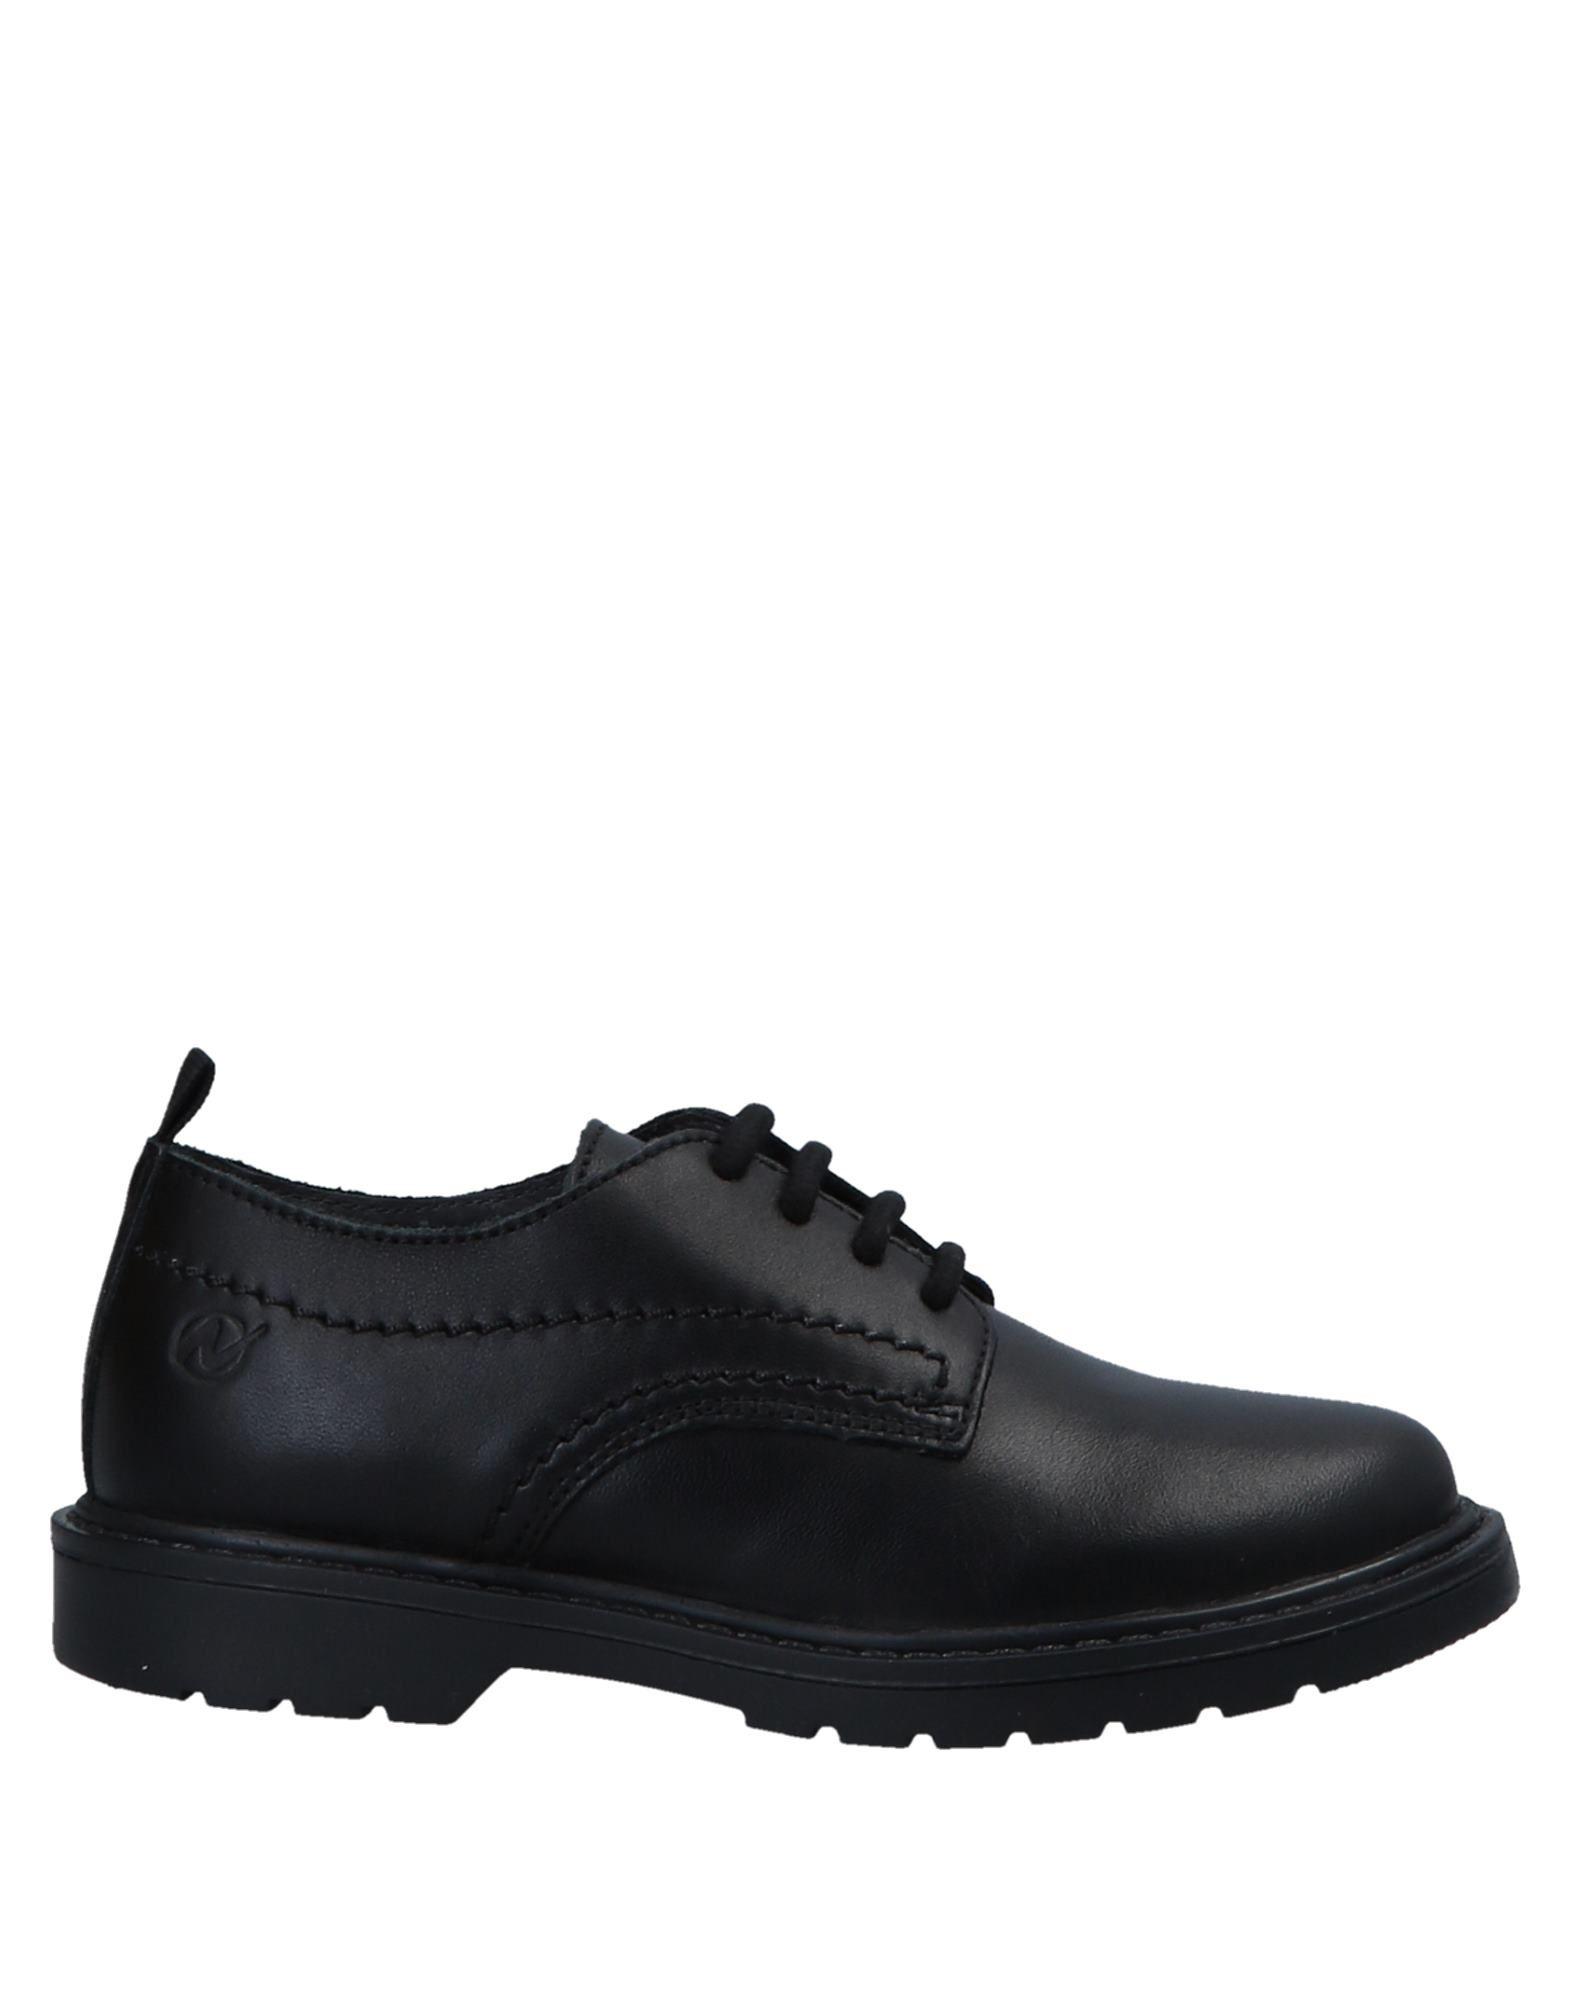 NATURINO Обувь на шнурках первый внутри обувь обувь обувь обувь обувь обувь обувь обувь обувь 8a2549 мужская армия green 40 метров